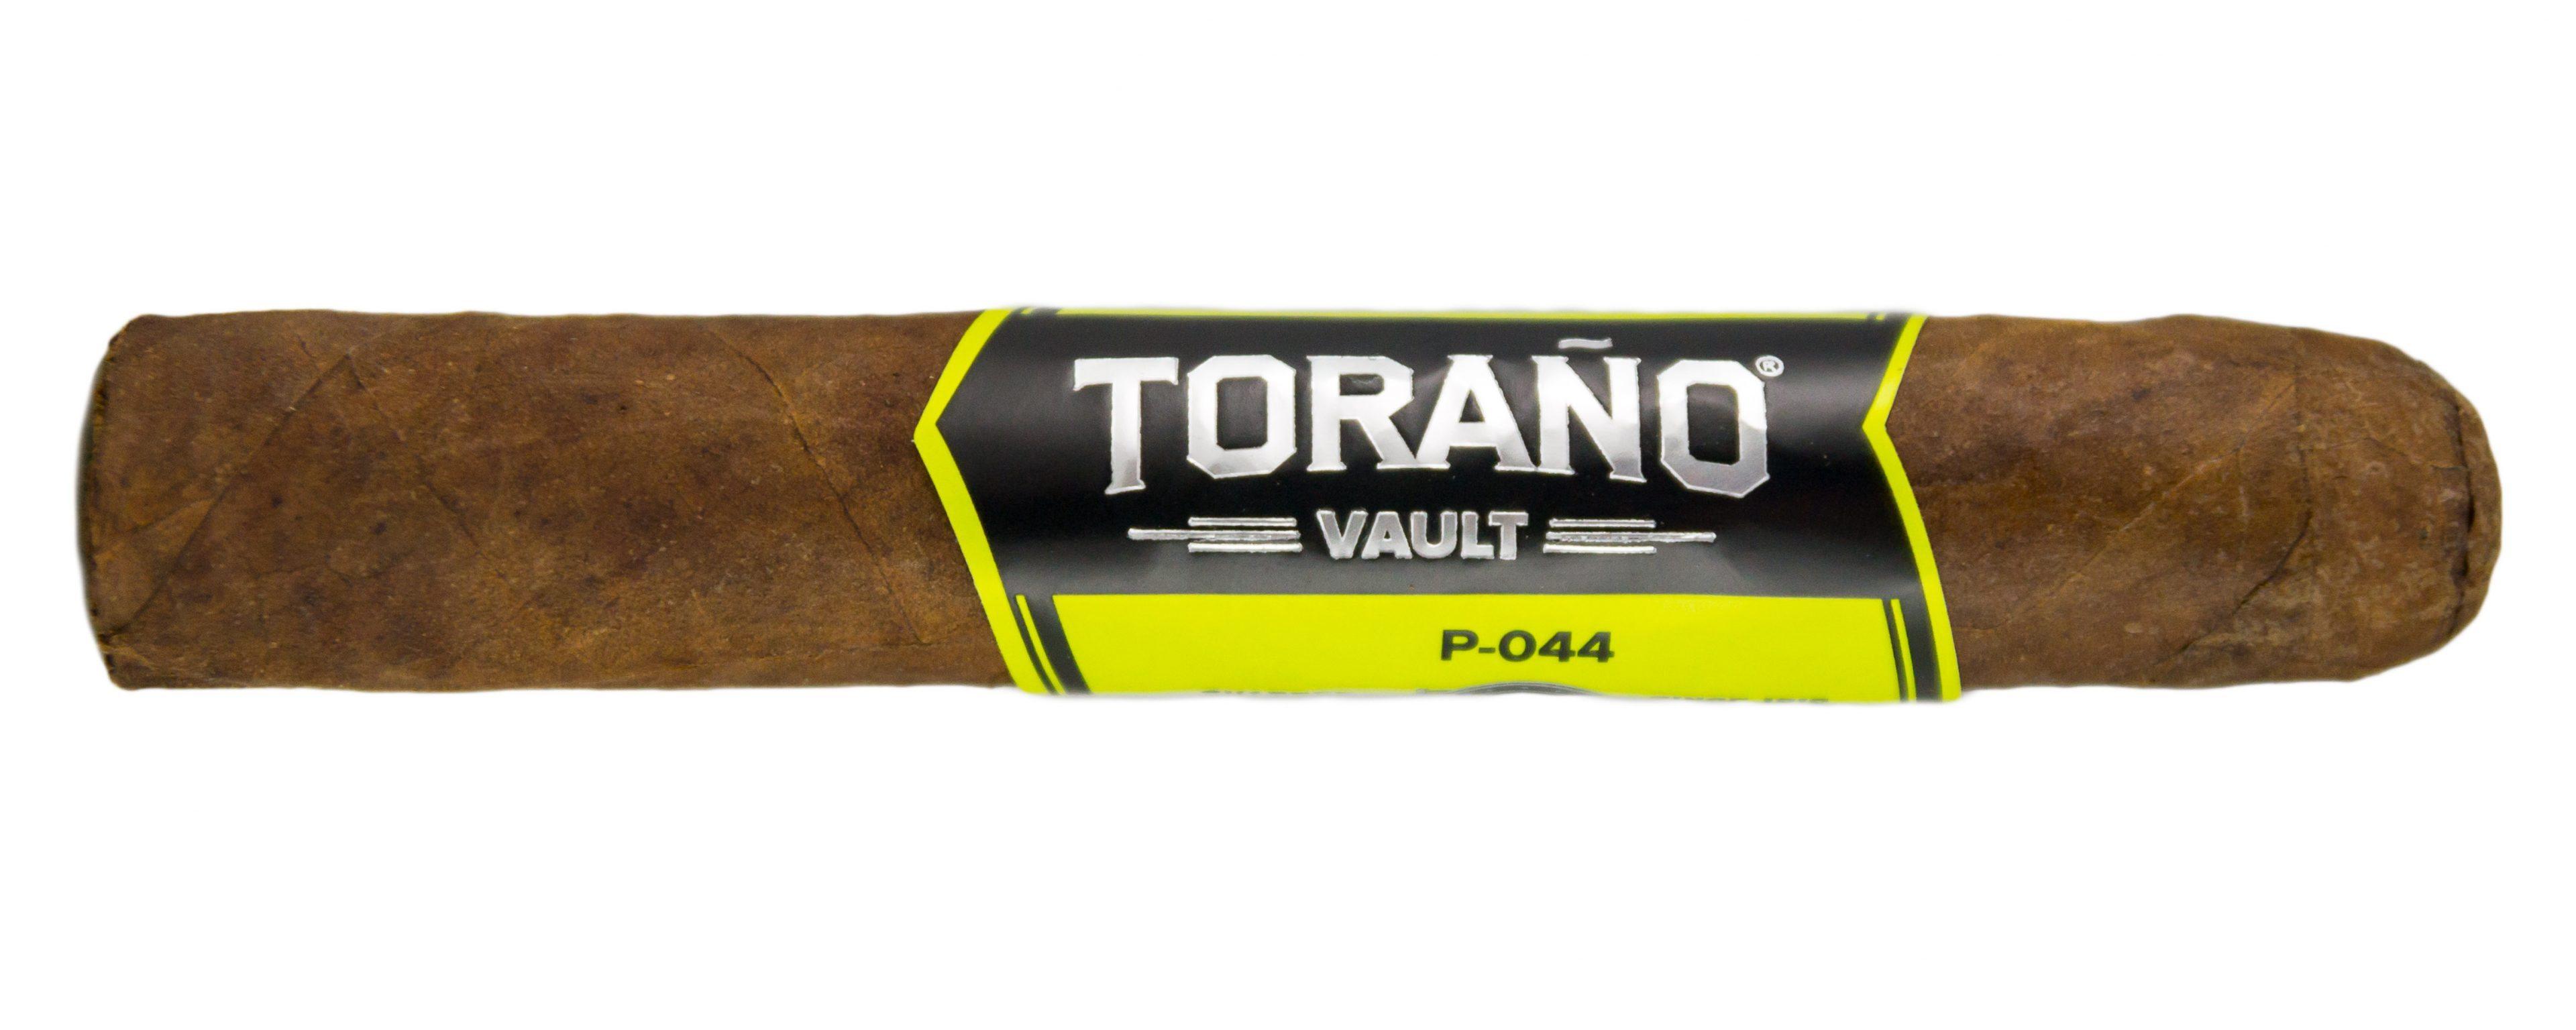 Blind Cigar Review: Carlos Torano   Vault P-044 Robusto